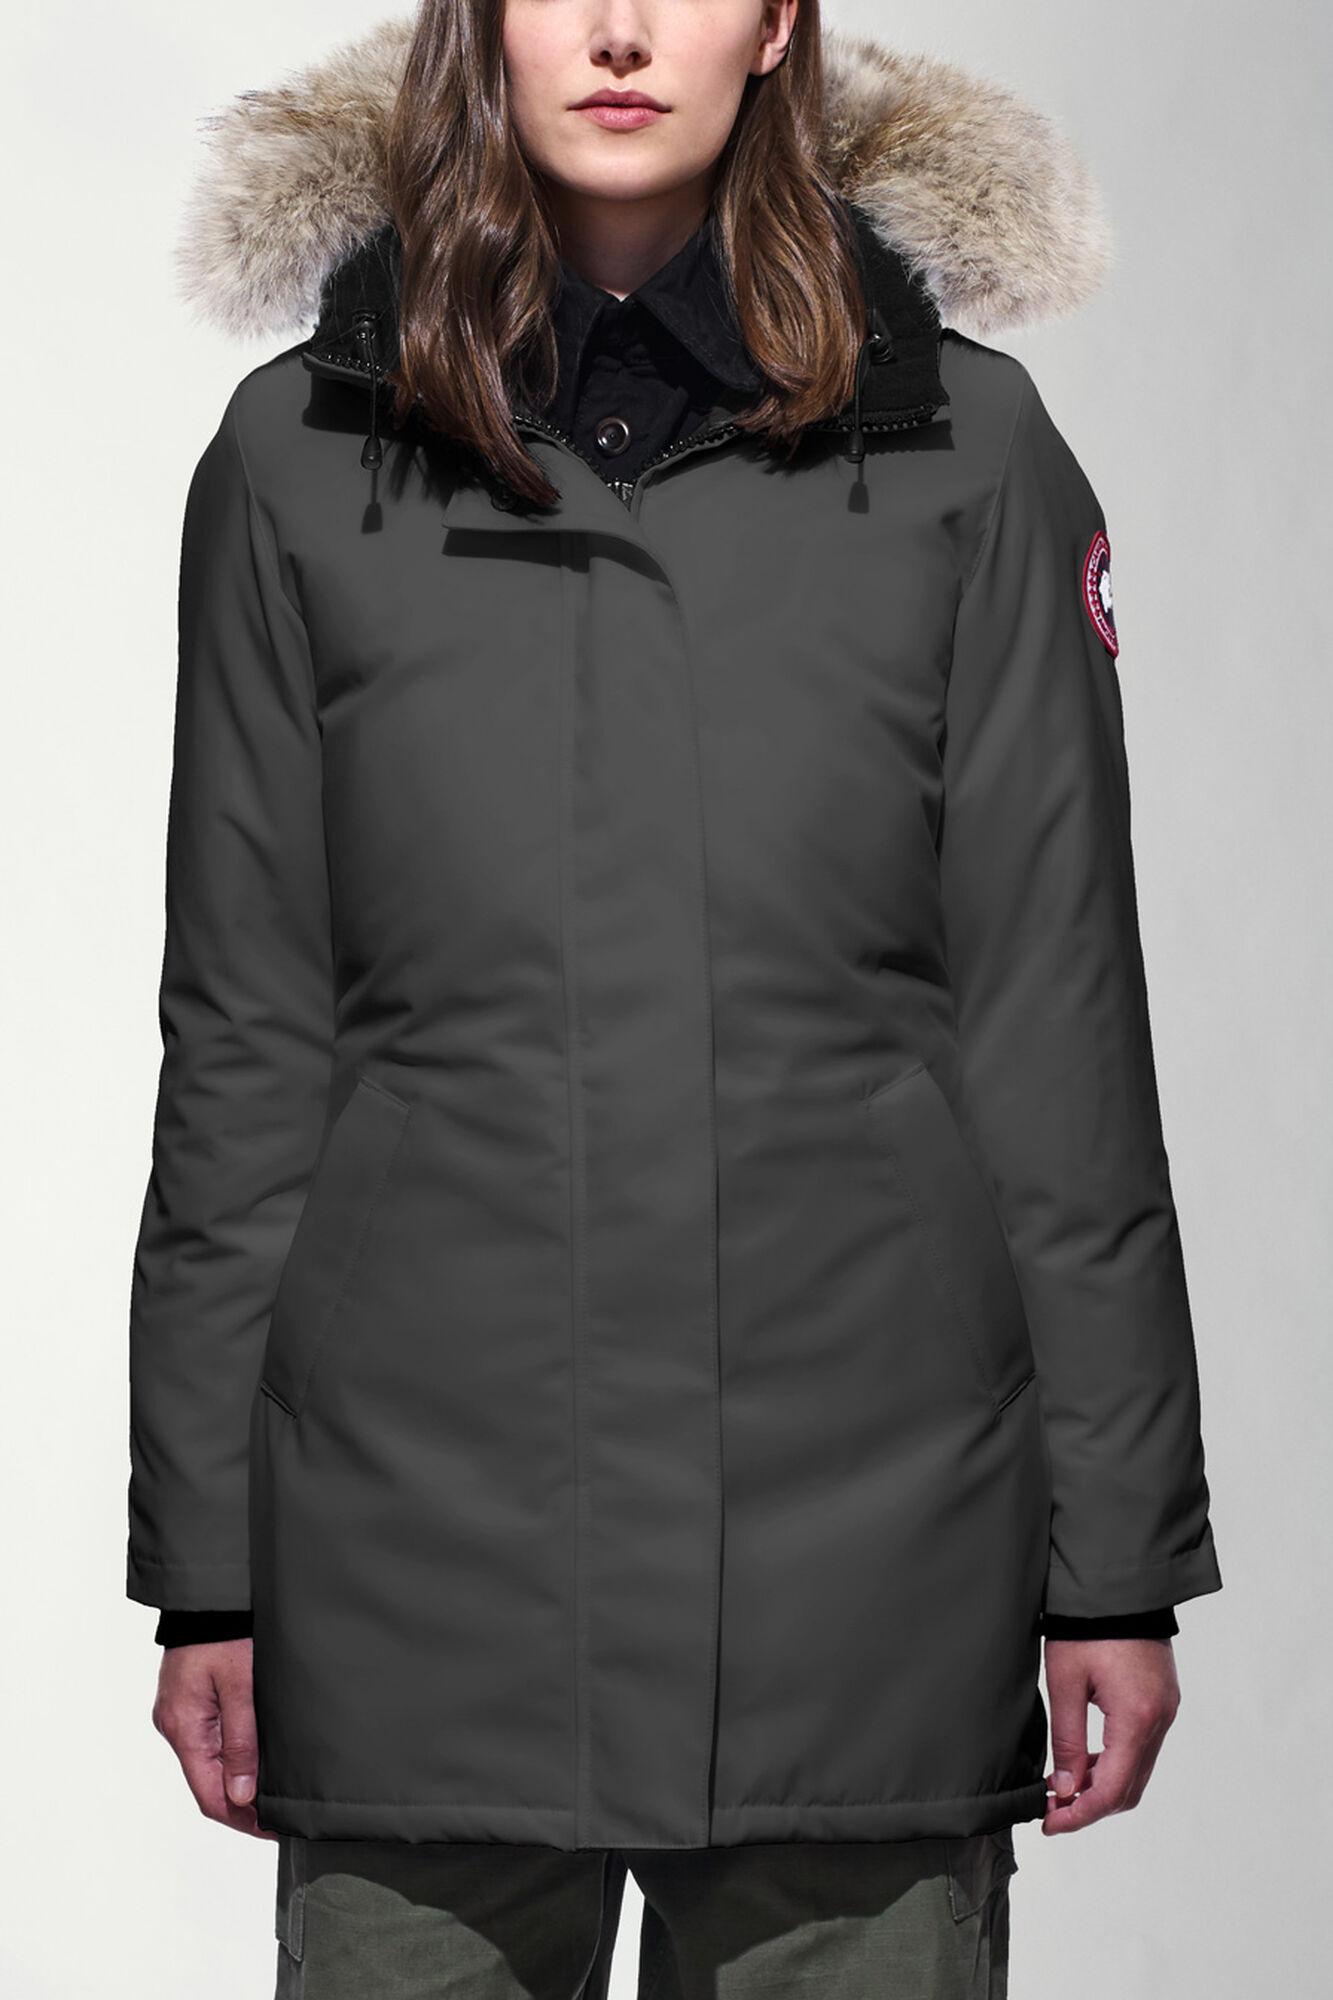 Canada Goose hats online shop - Victoria Parka | Canada Goose?